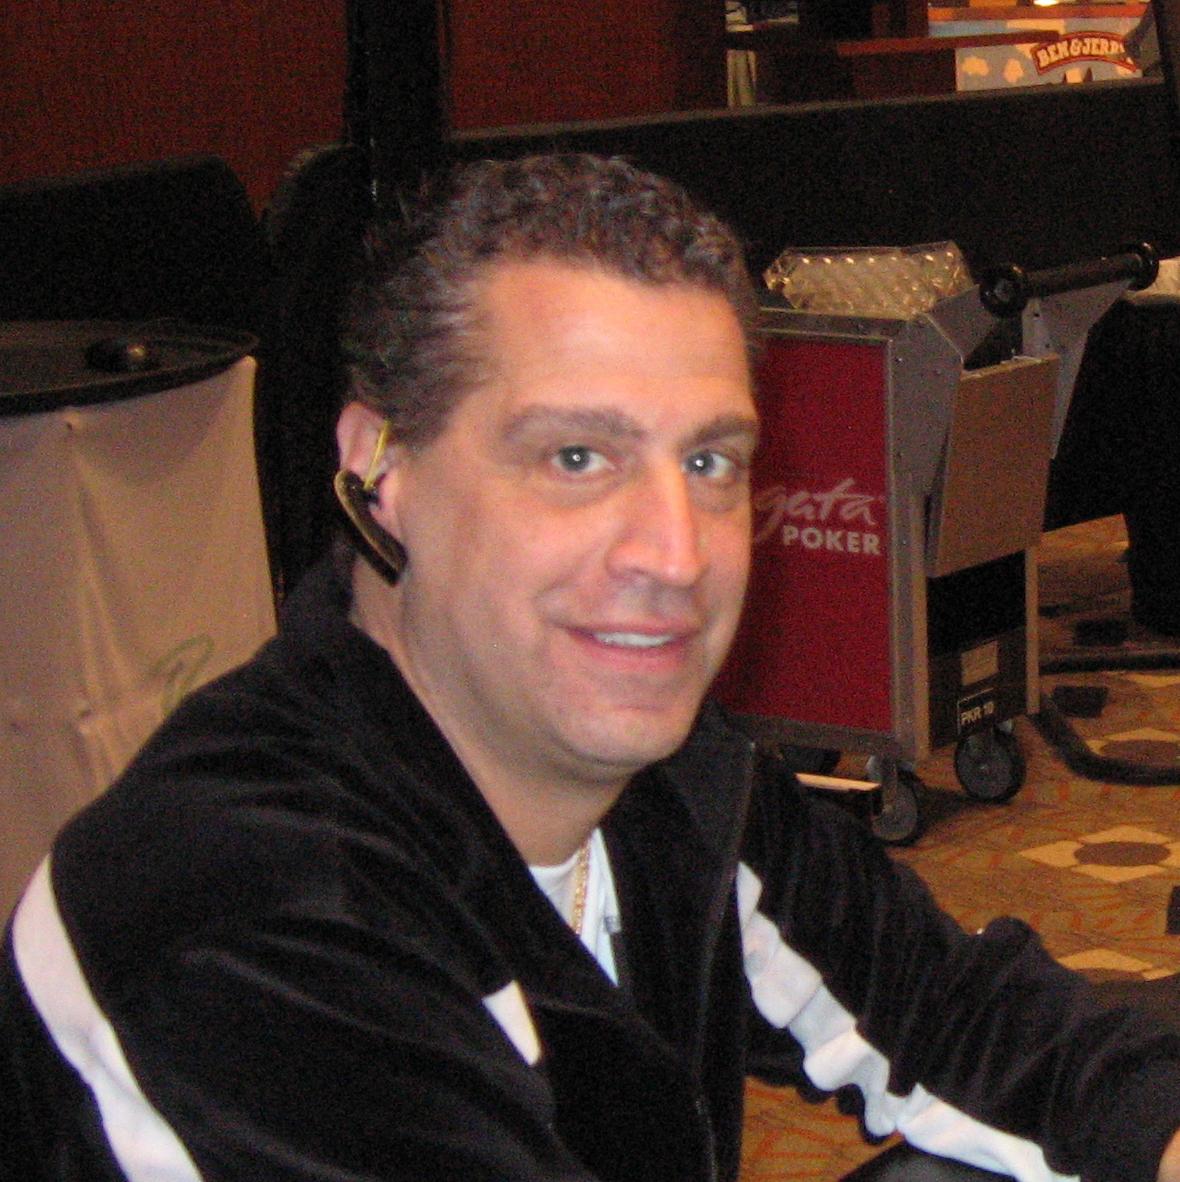 Borgata Winter Poker Open 2011 Event 22 Teutonico Talks